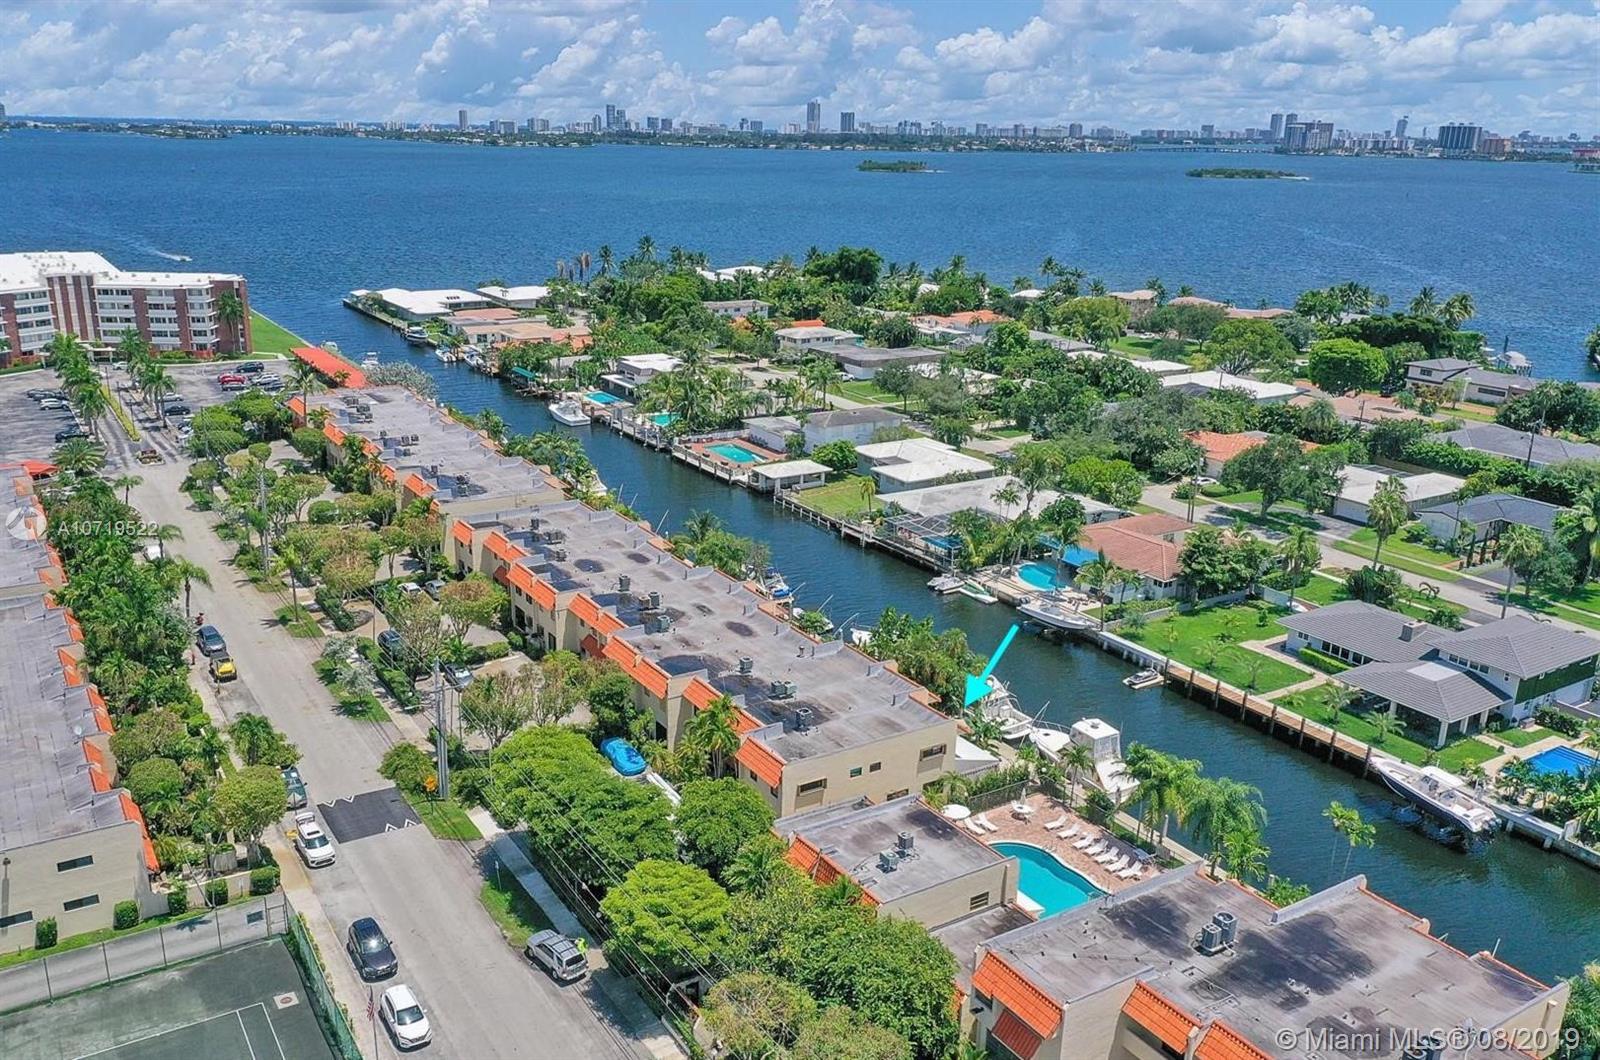 Miami Shores #B-12 - 03 - photo